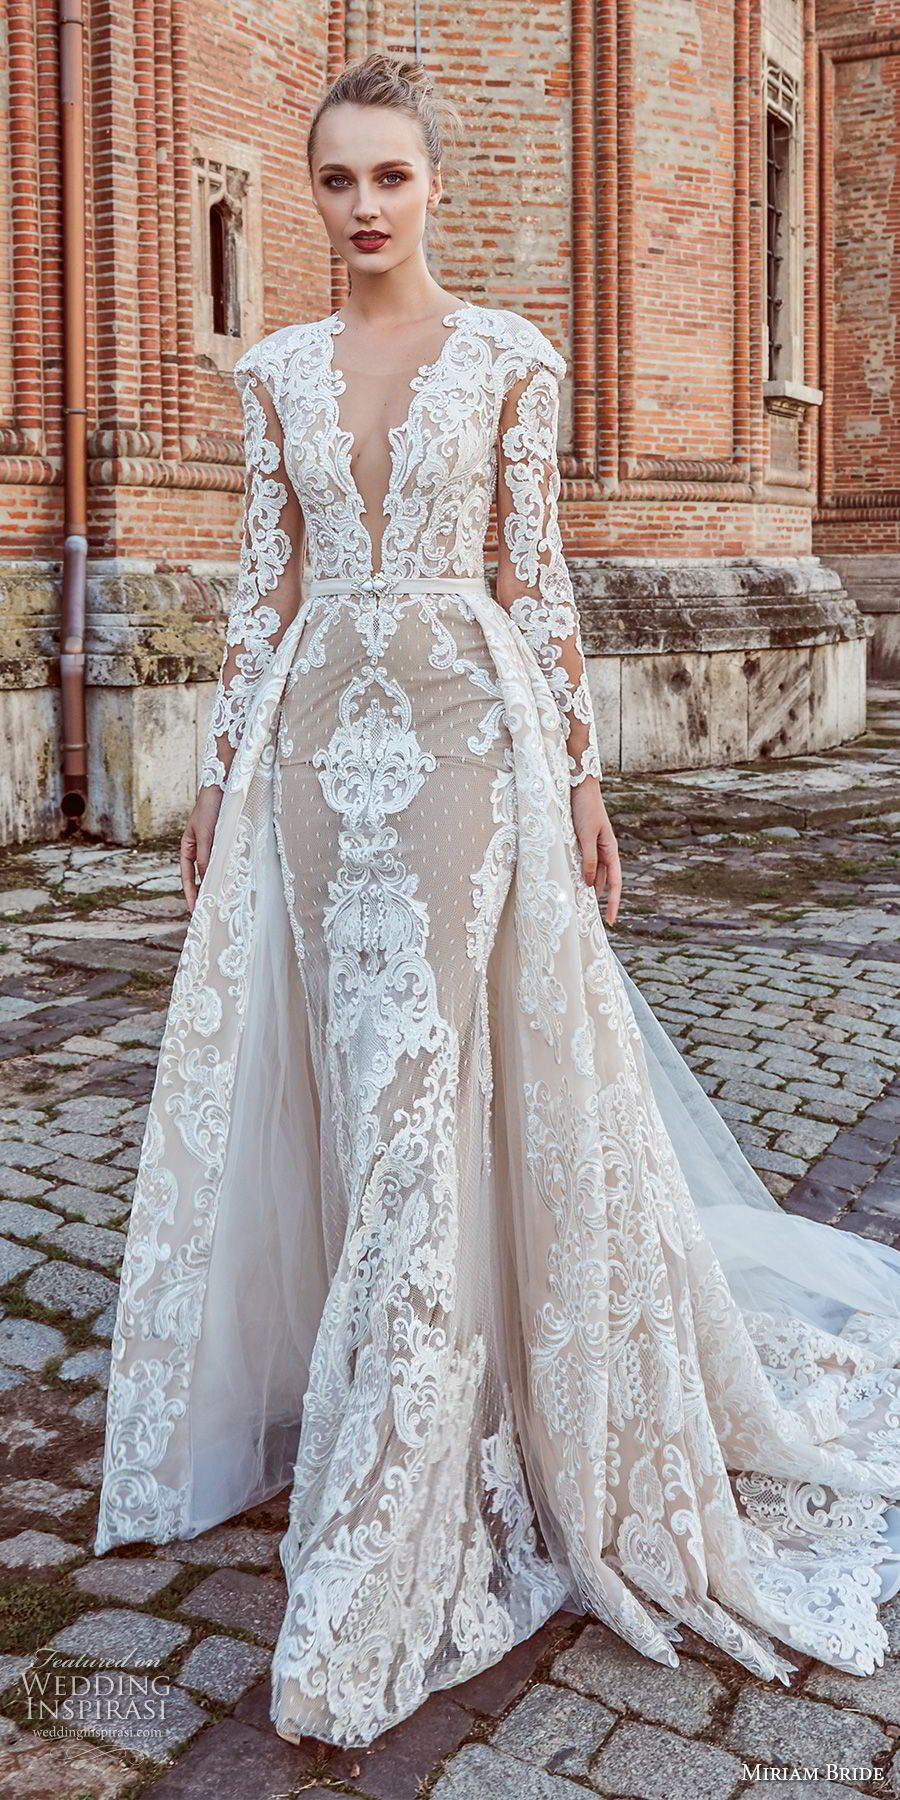 Sheer long sleeve wedding dresses  Miriams Bride  Wedding Dresses  Wedding dress Elegant and Royals